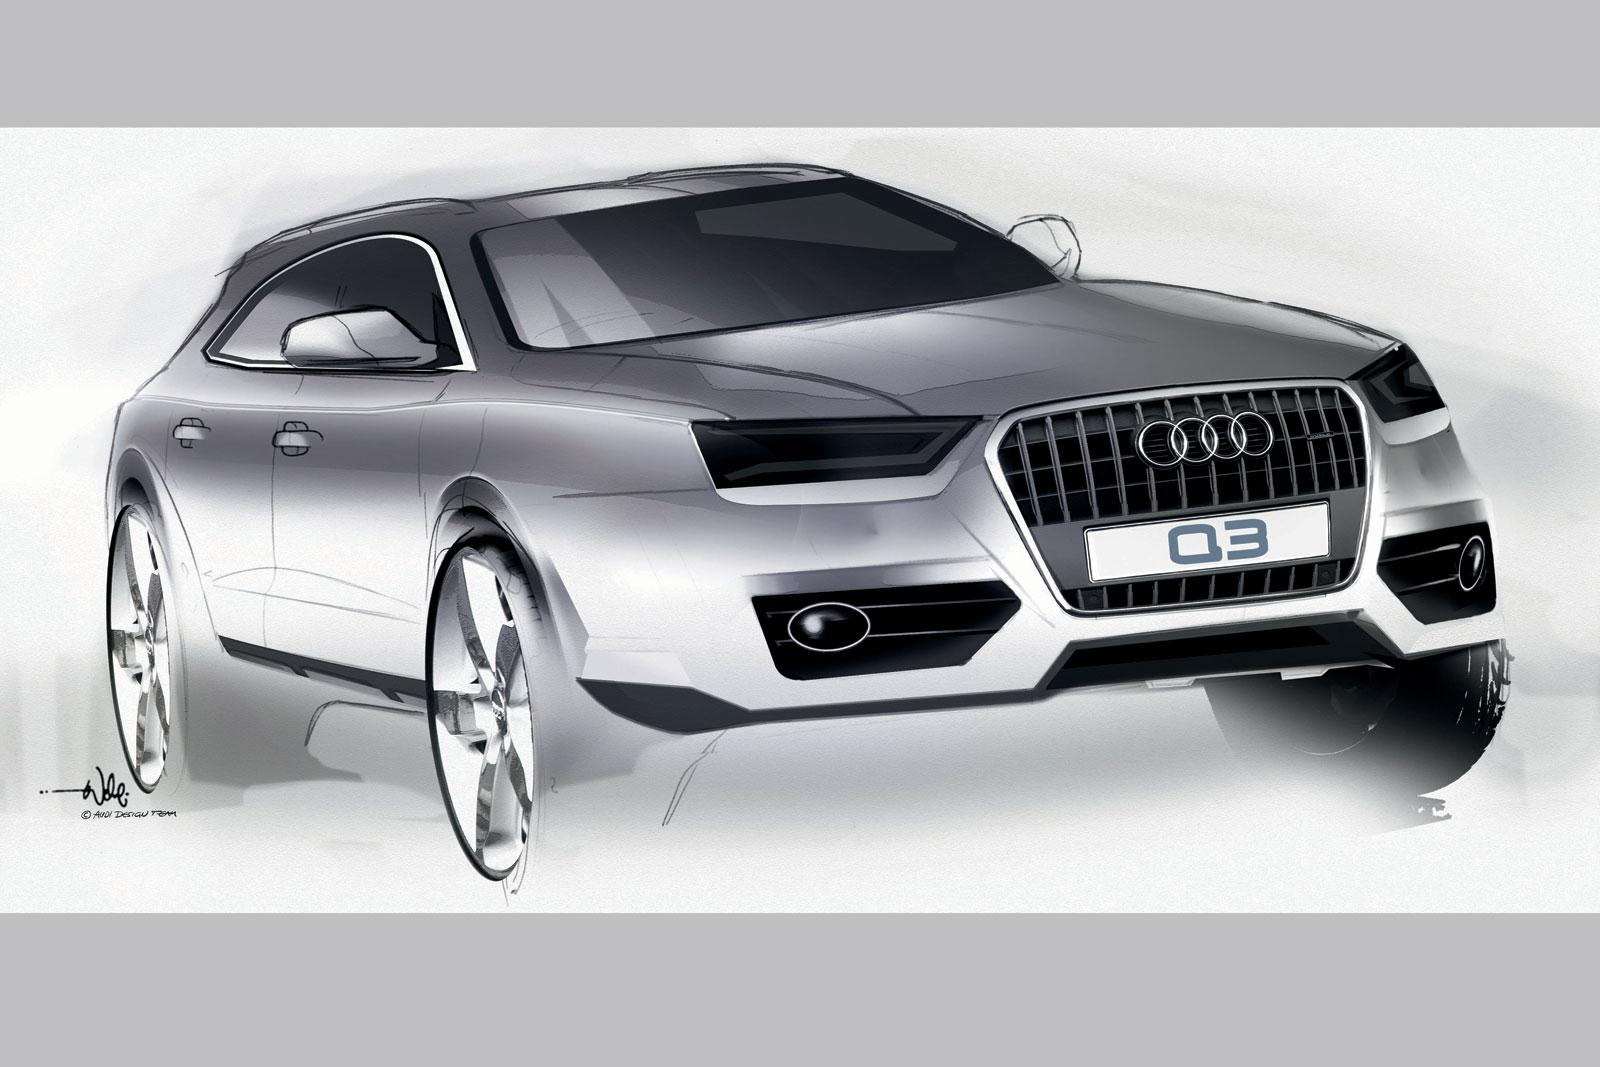 http://1.bp.blogspot.com/-AHYrys8bMnk/TZ9dM4saajI/AAAAAAAAEcI/hN2K3FUiCso/s1600/Audi-Q3-Teaser-Sketch-1.jpg